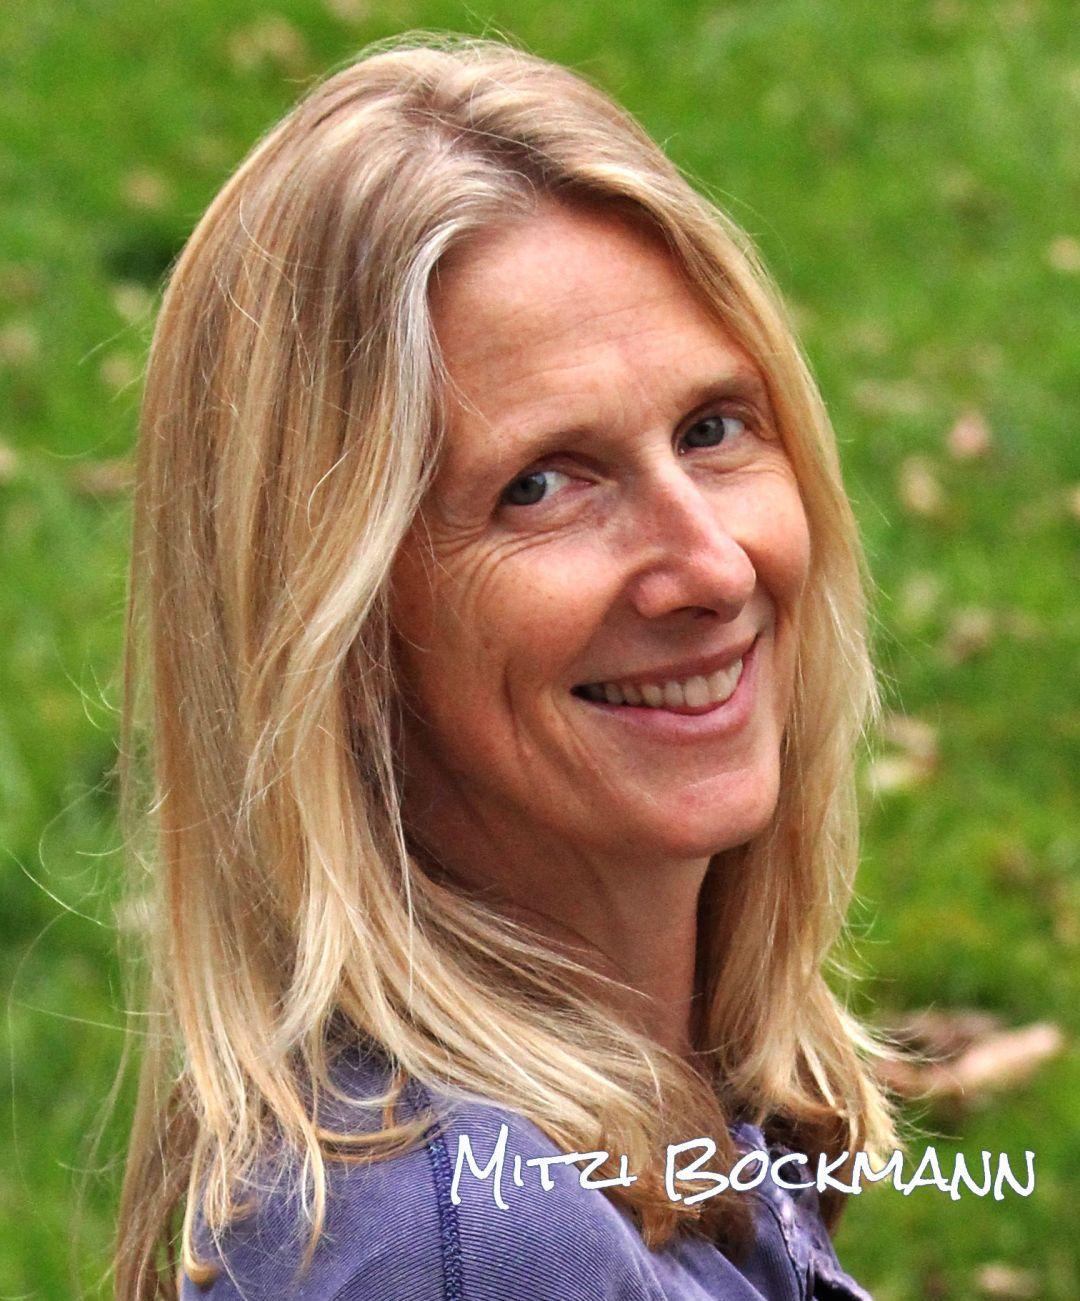 Mitzi Bockmann, Certified Life Coach